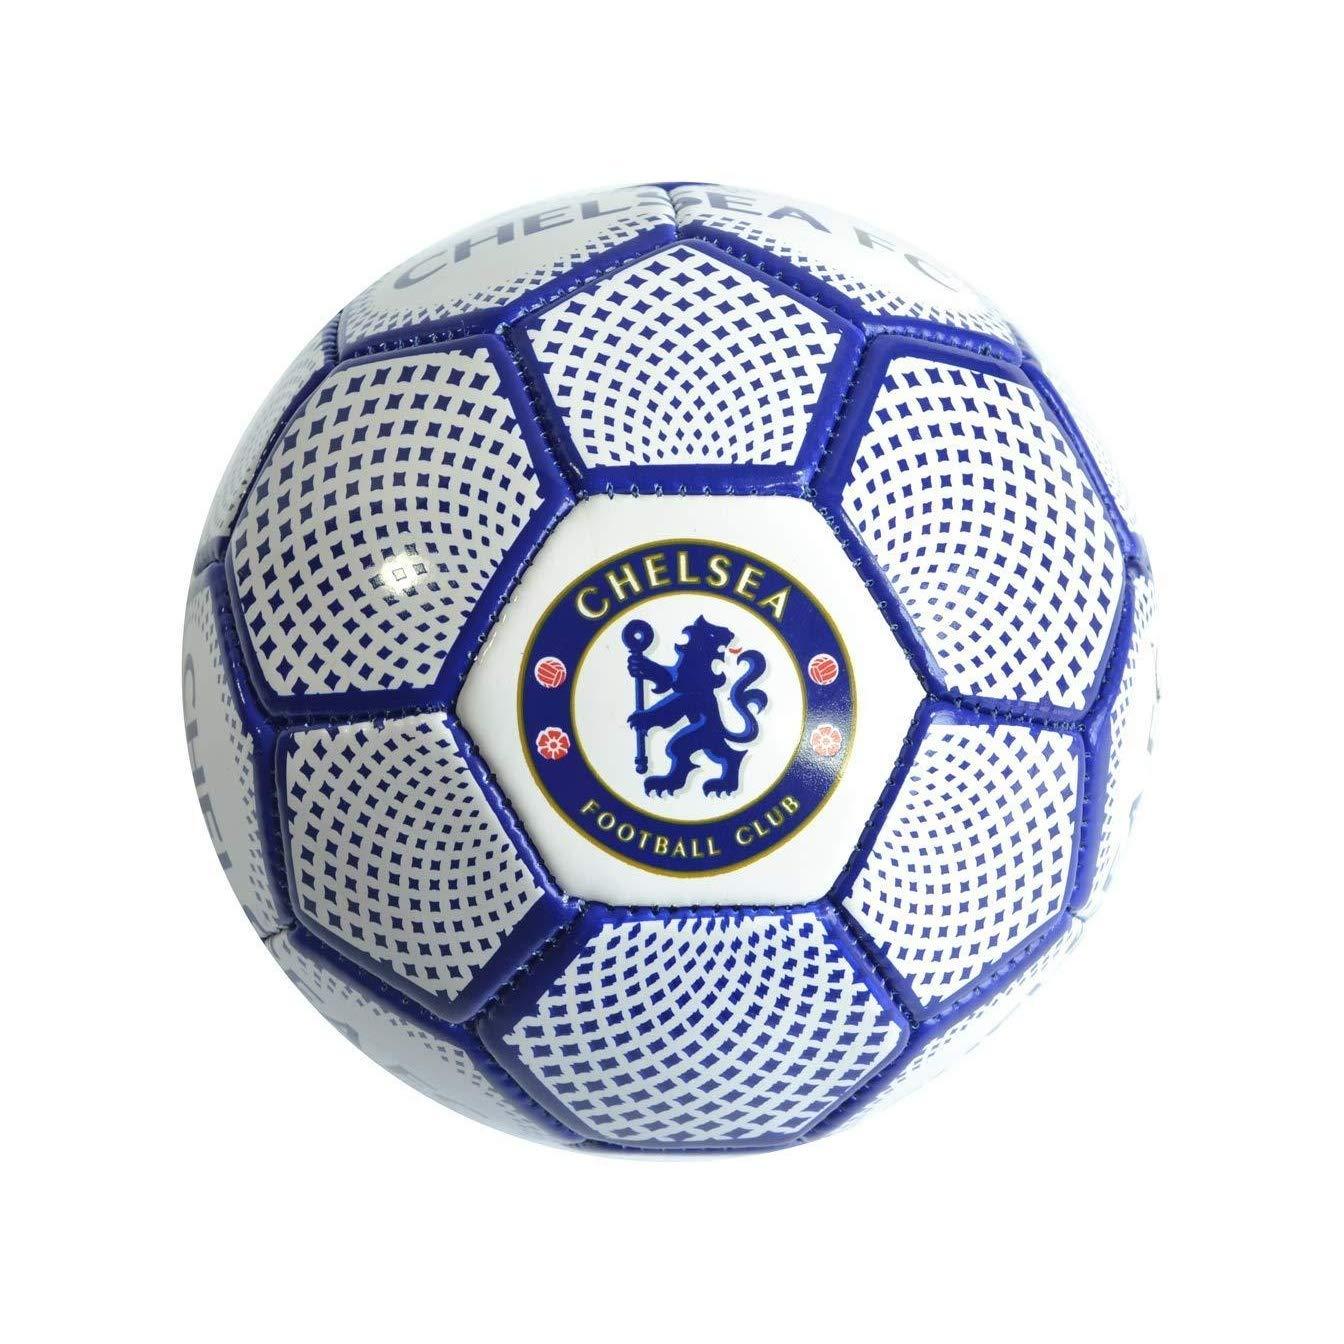 Chelsea F.C. Diamond Balón de fútbol, Juventud Unisex, Blanc y ...